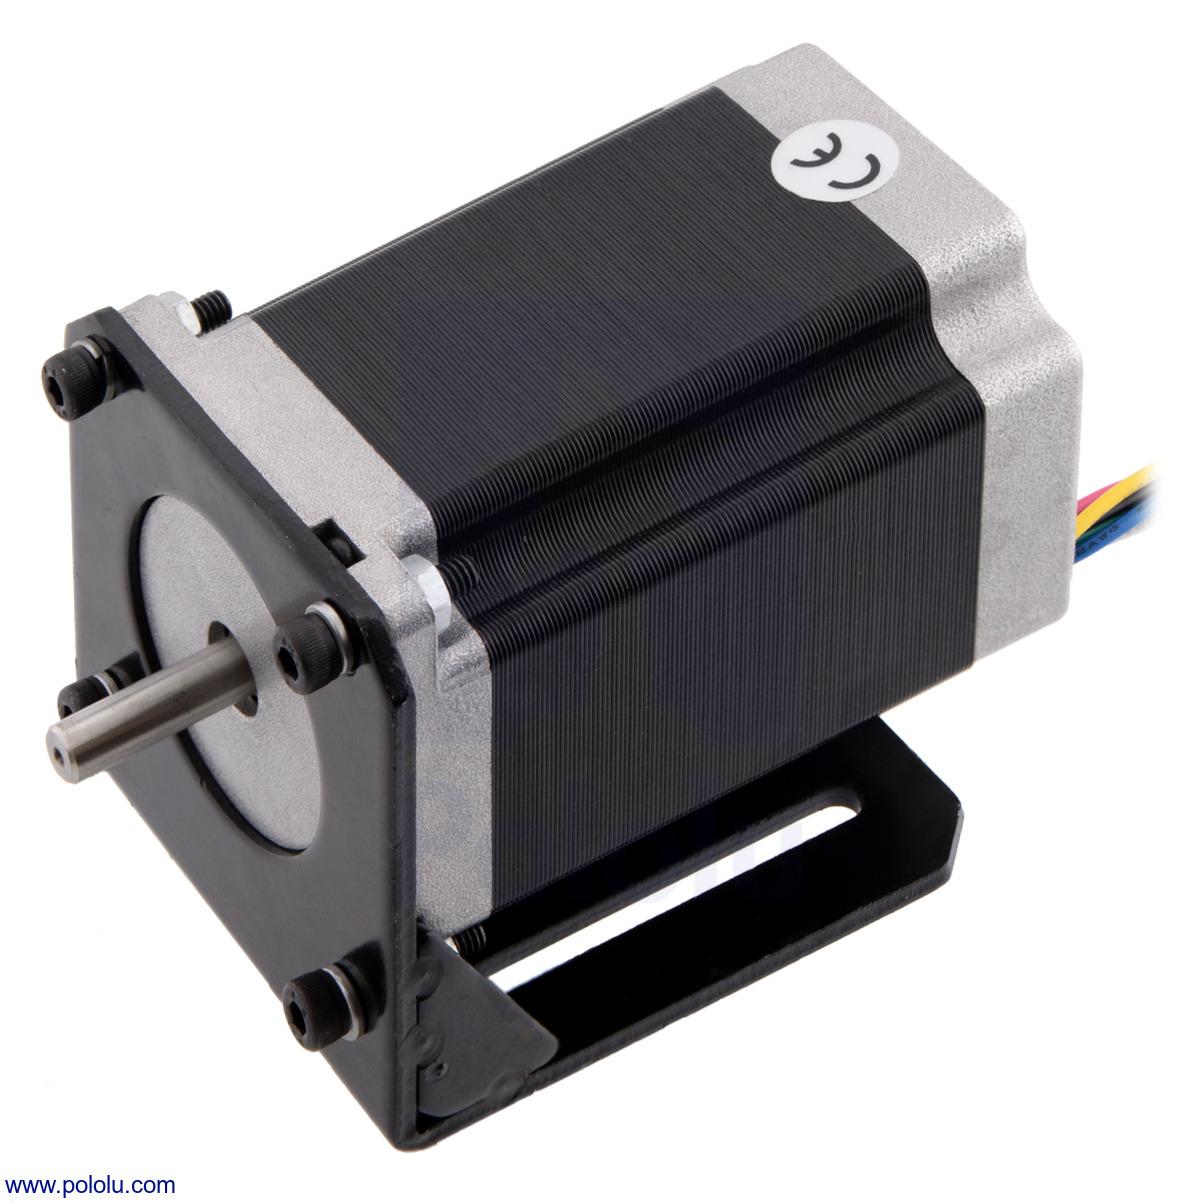 hight resolution of nema 23 stepper motor item 1475 mounted with a steel l bracket for nema 23 stepper motors